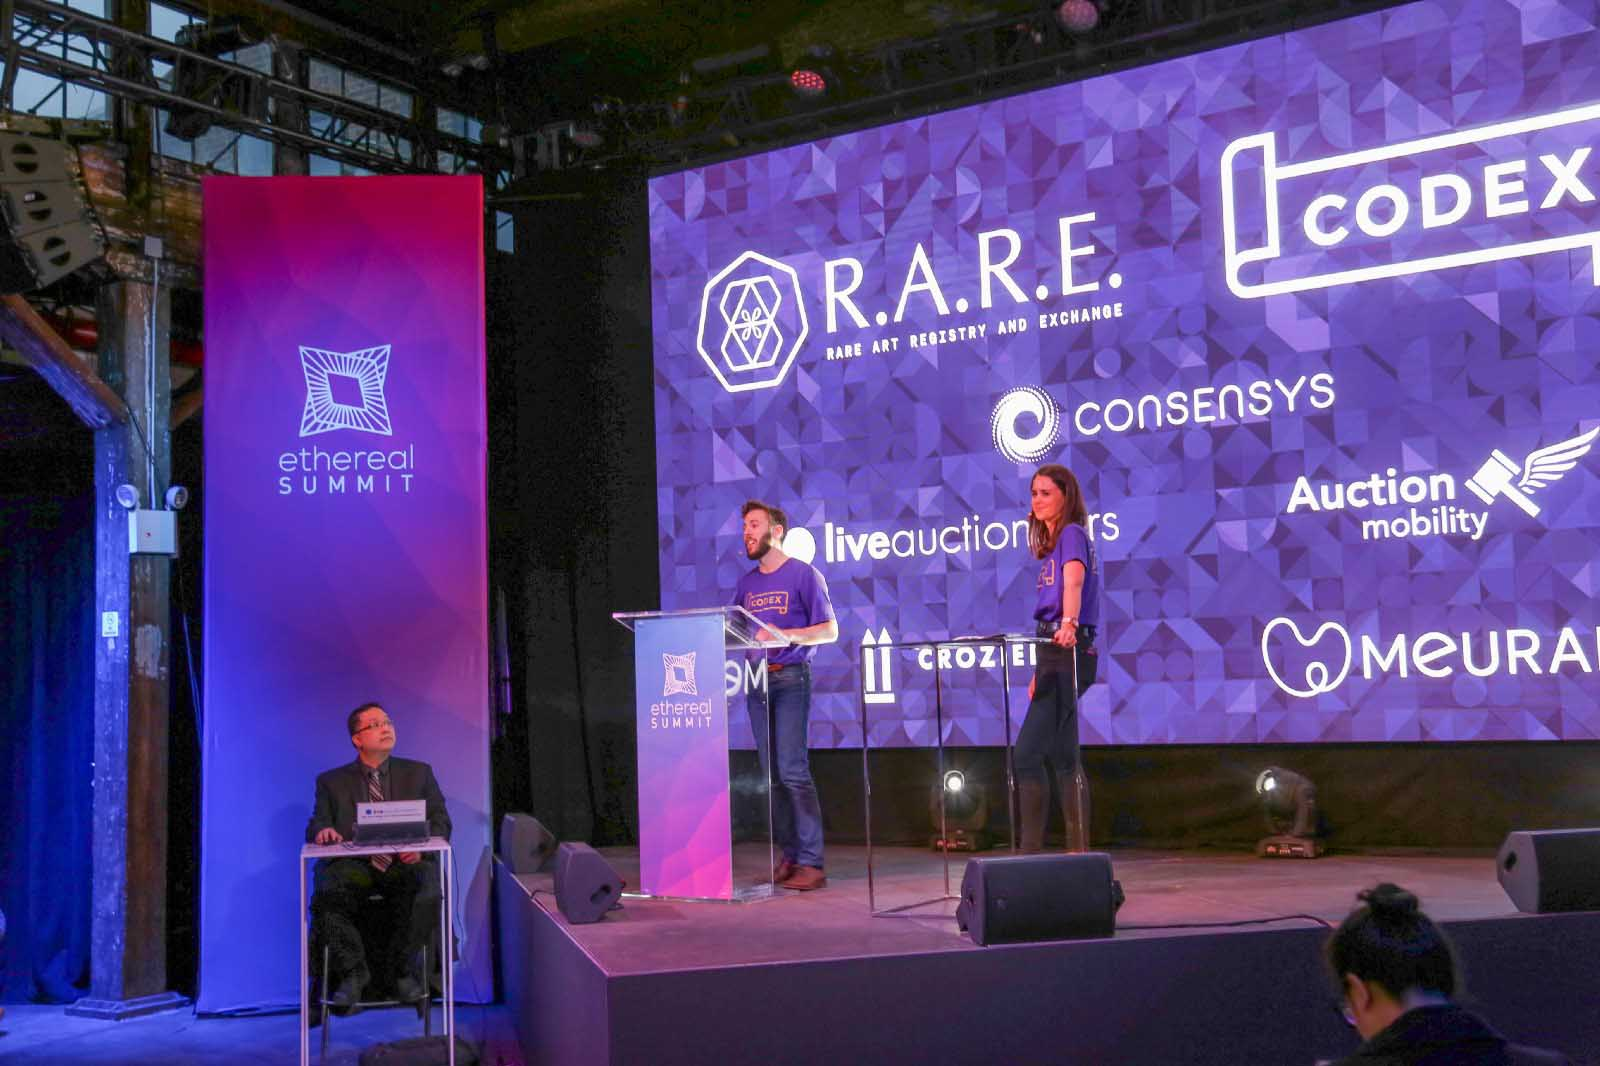 Blockchain Art Auction Raises over $190,000 Cryptokitties Crypto cryptocurrency new york codex protocol consensys rare life art auction